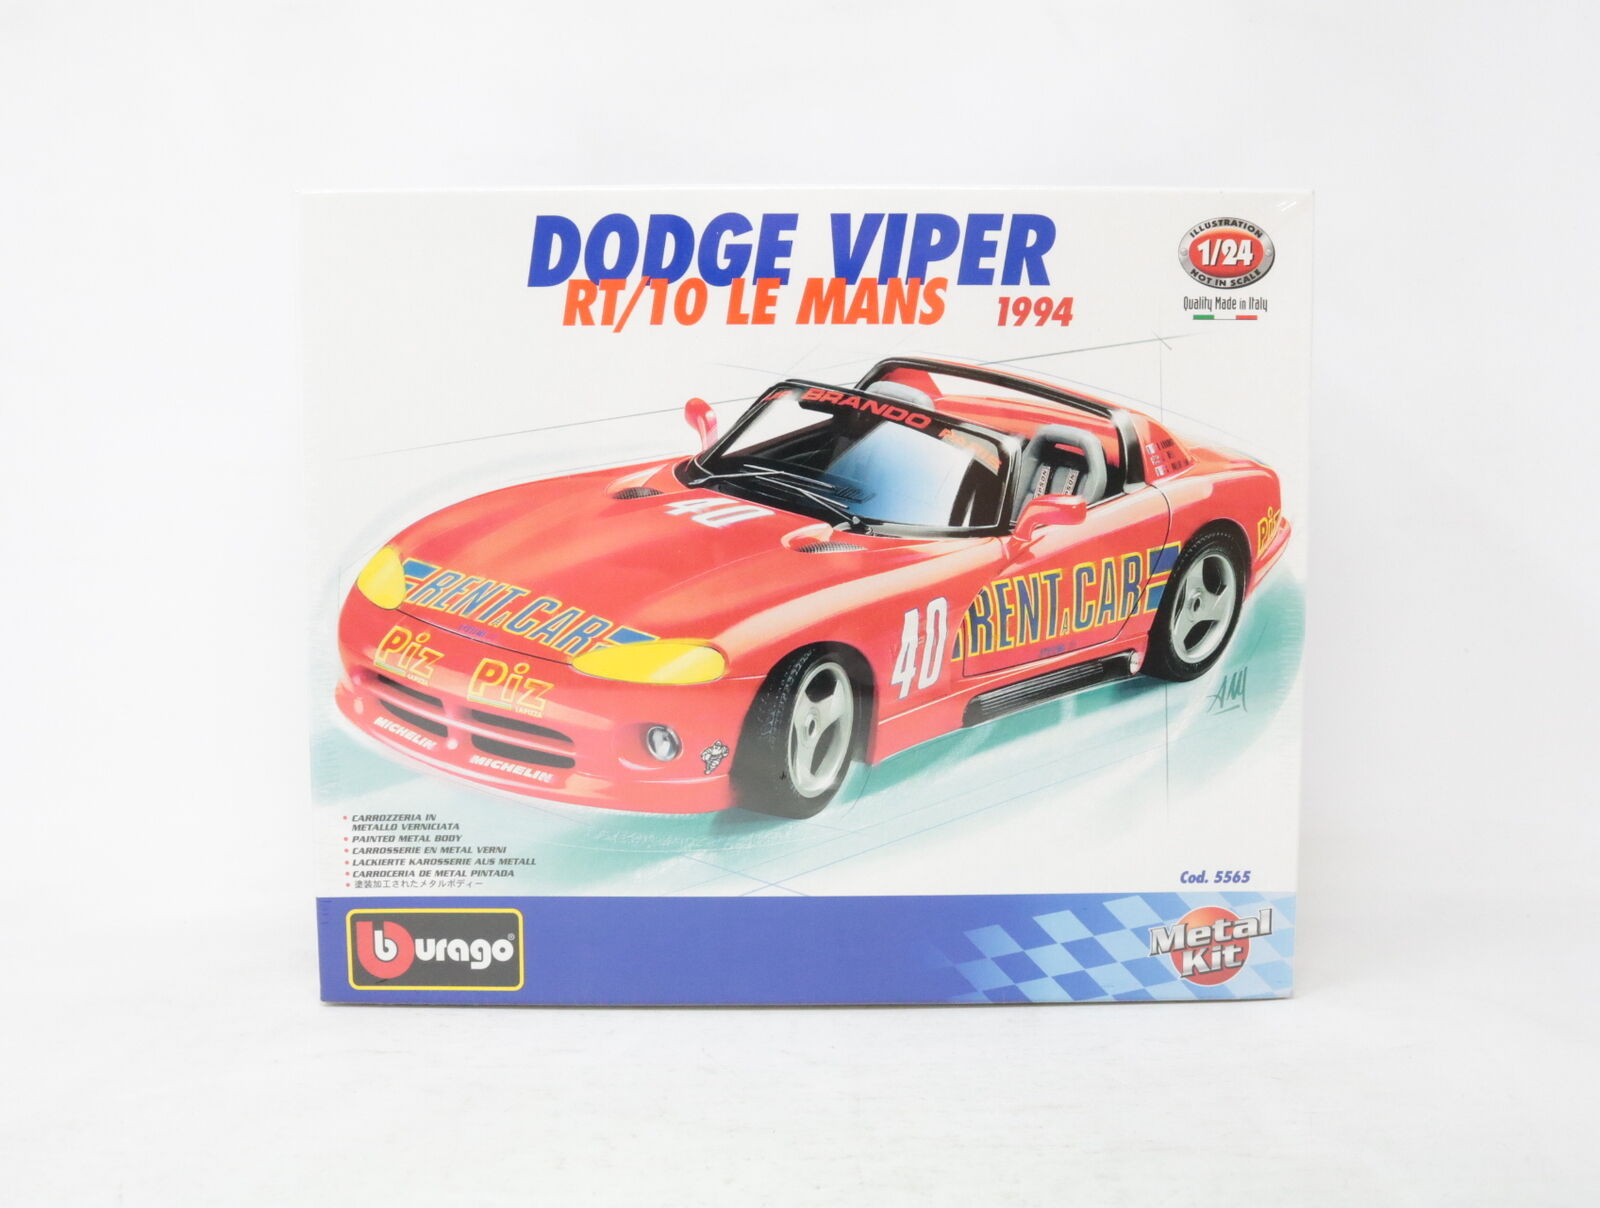 1 24 BBURAGO METAL KIT DODGE VIPER RT 10 LE MANS cod. 5565  [WE-017]